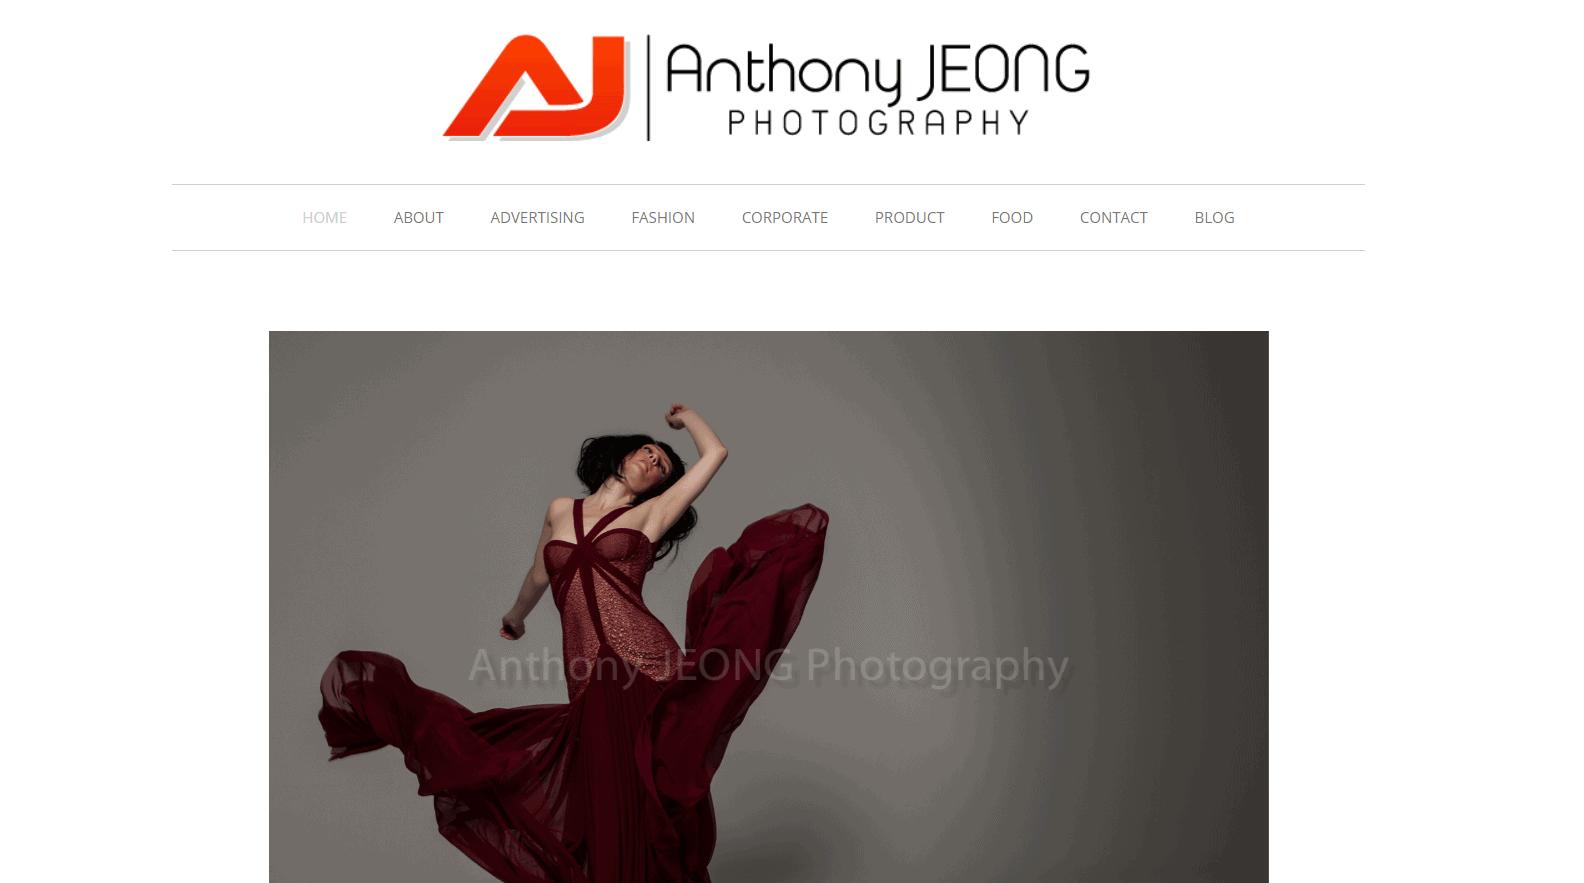 anthony jeong photography